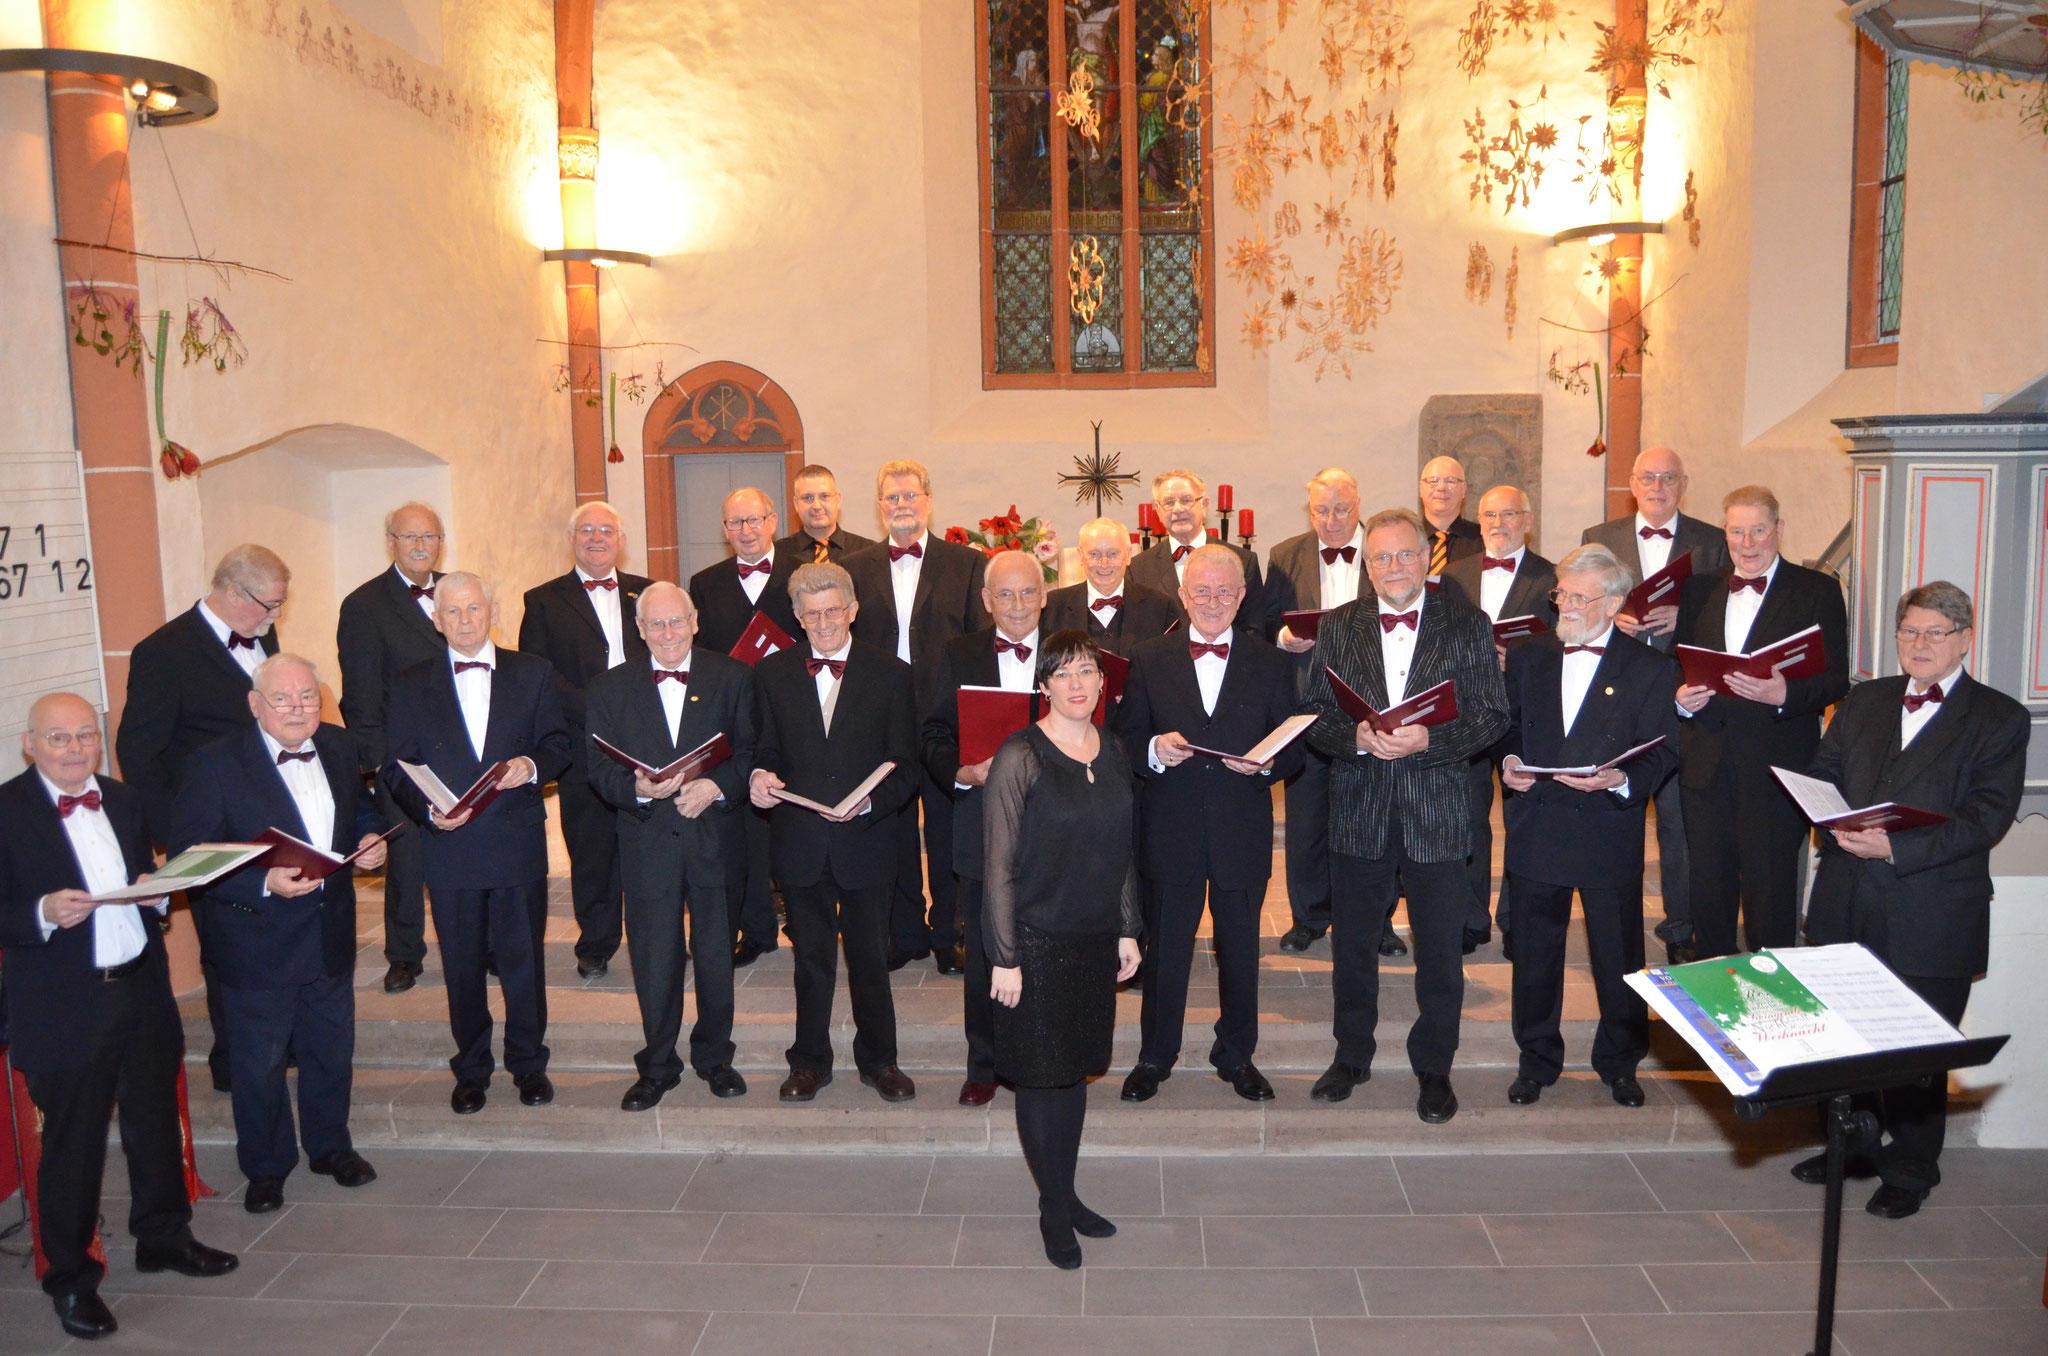 Adventskonzert 2014 mit dem Kasseler Herrenchor